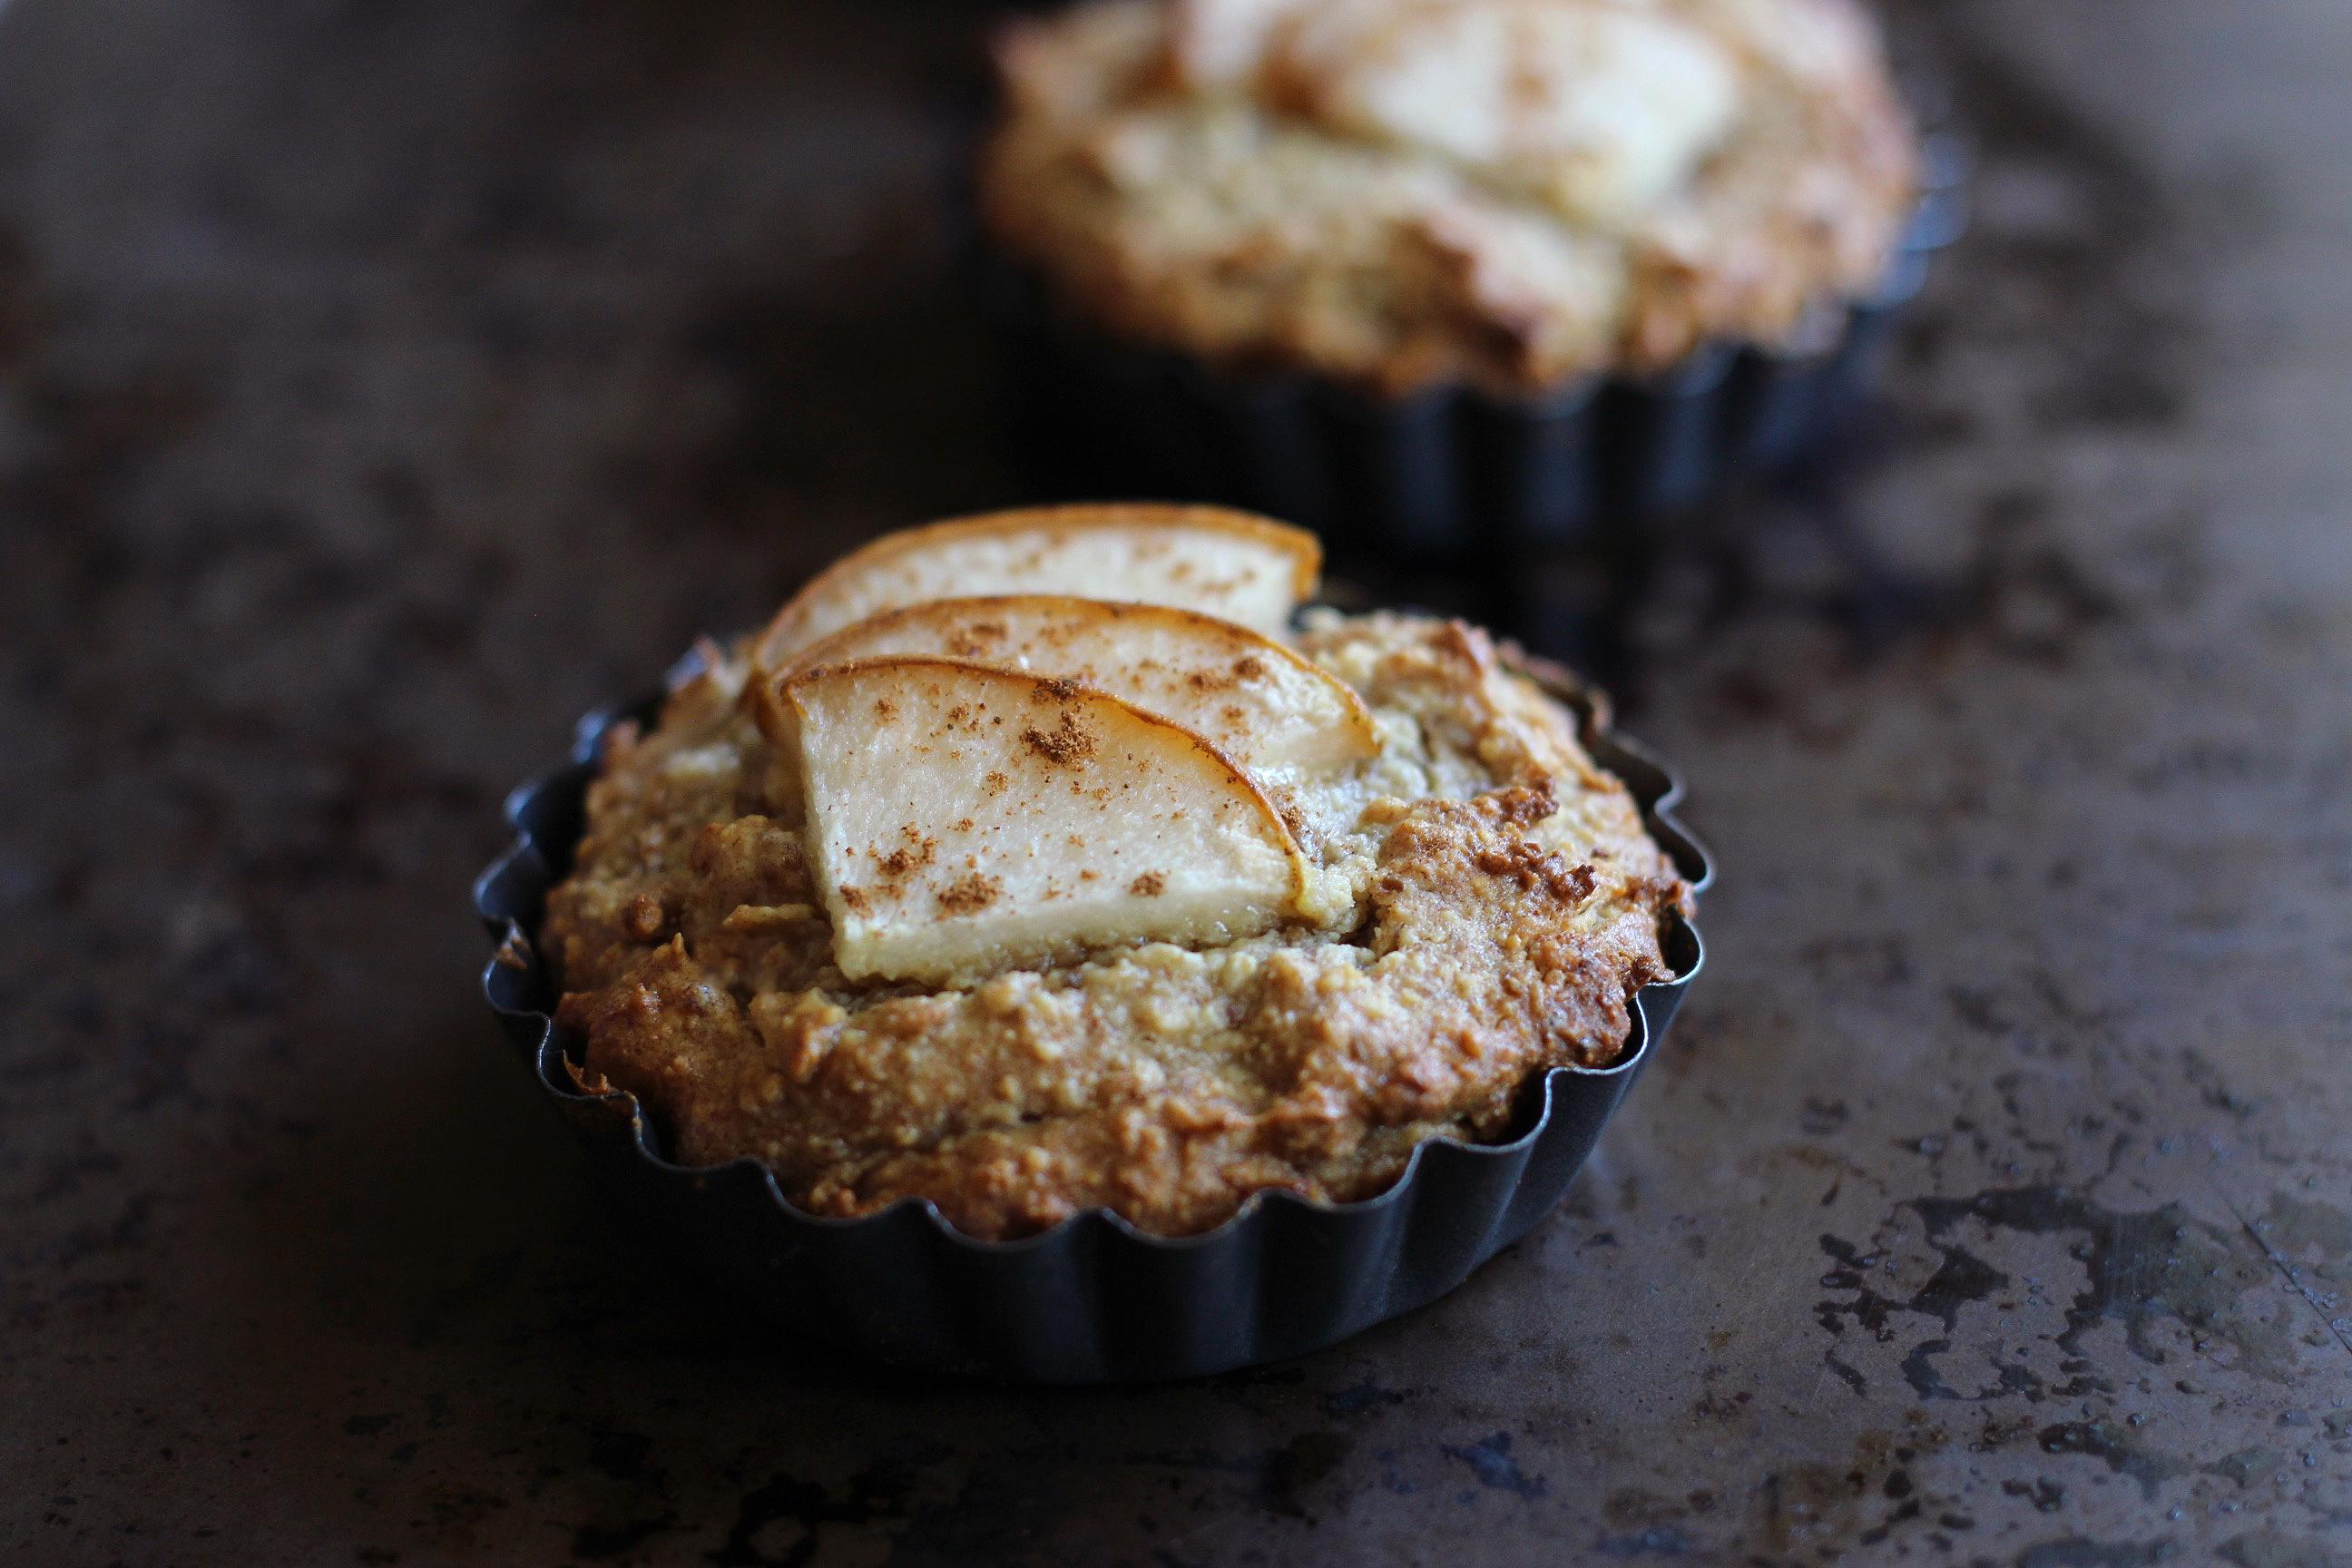 paleo-paparazzi-mini-pear-cake-paleo-glutenfree